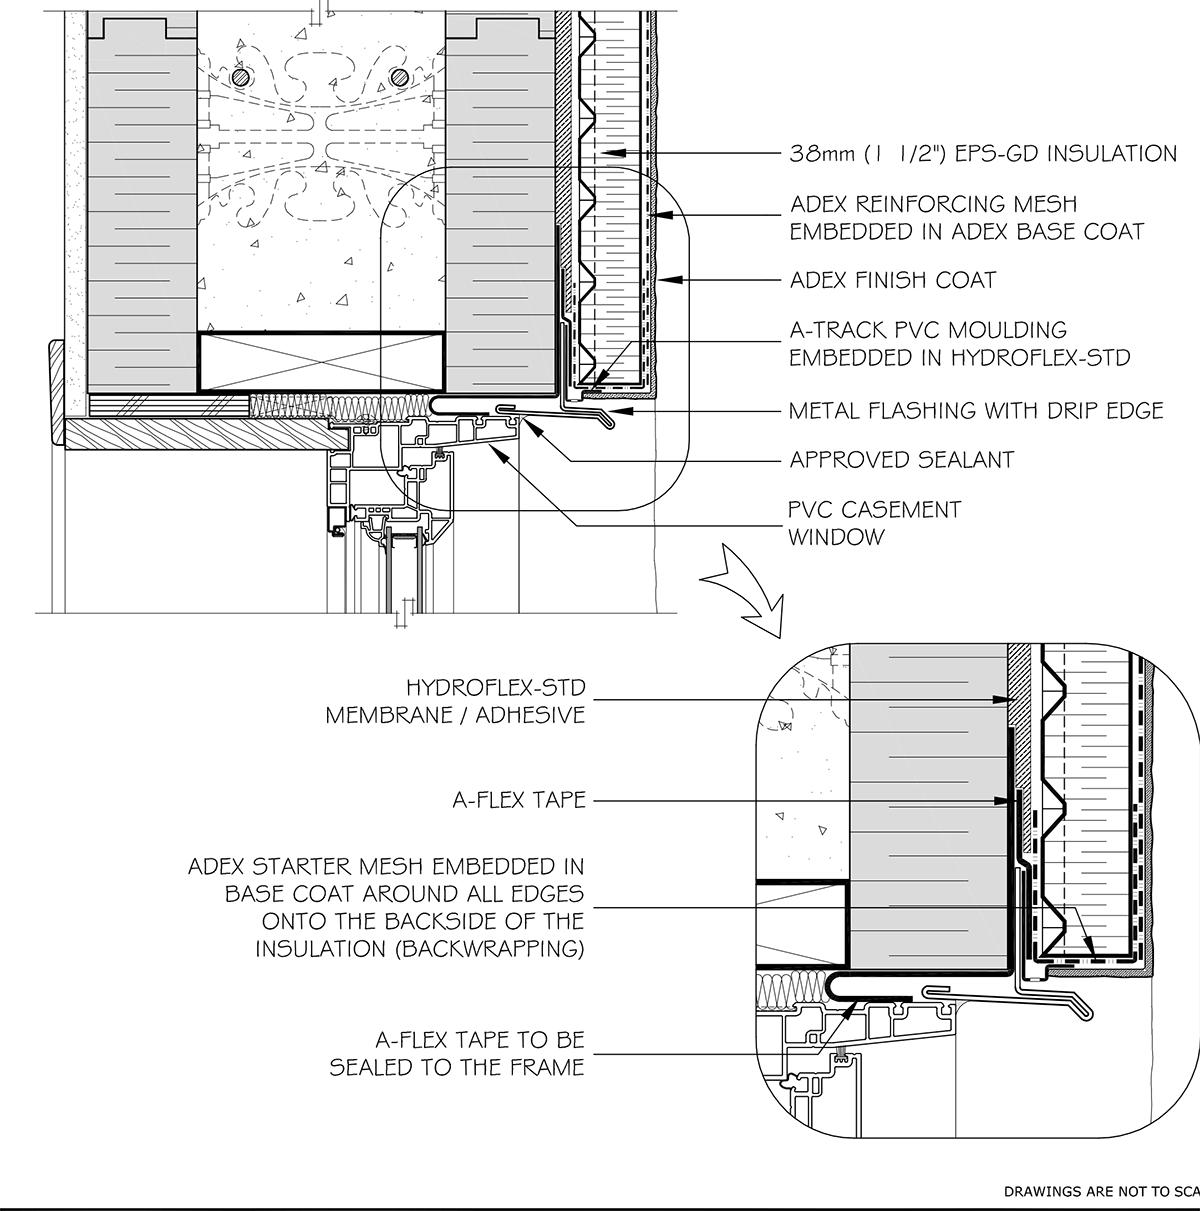 5 Window Head Pvc Adex